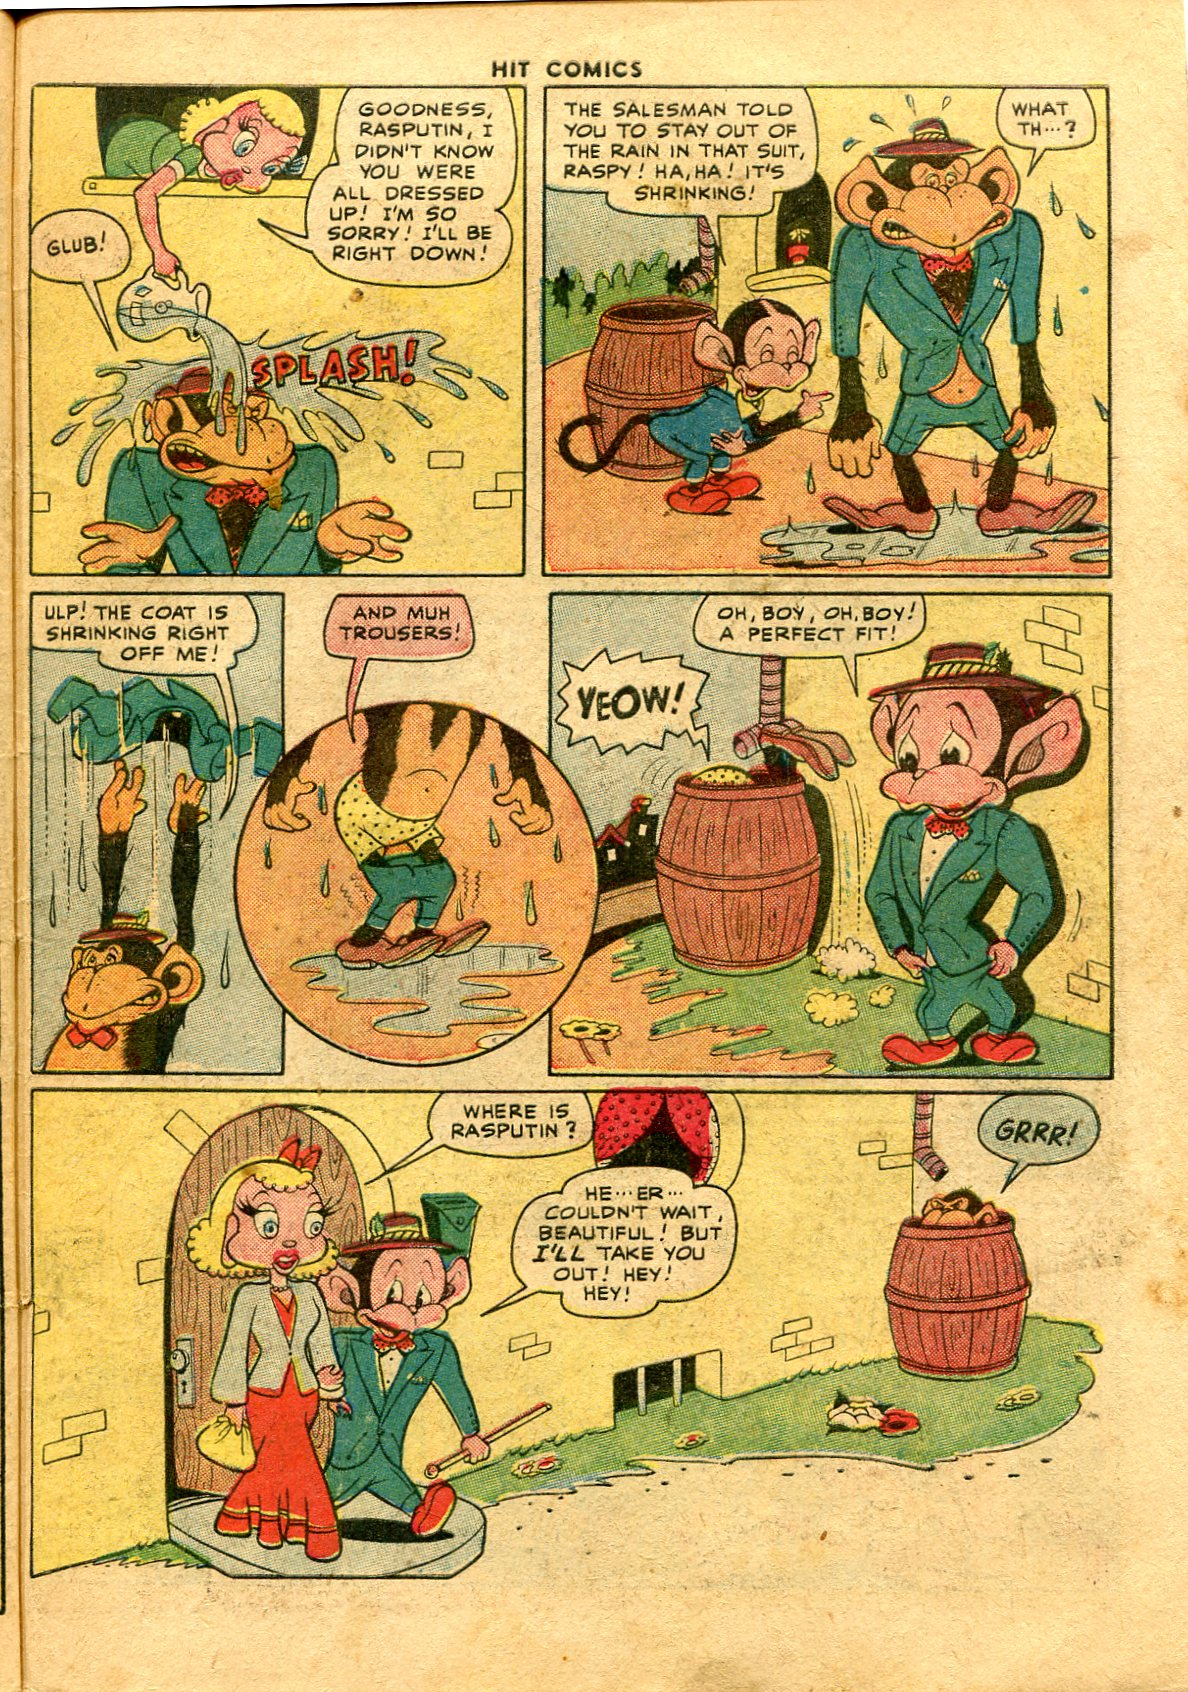 Read online Hit Comics comic -  Issue #48 - 49